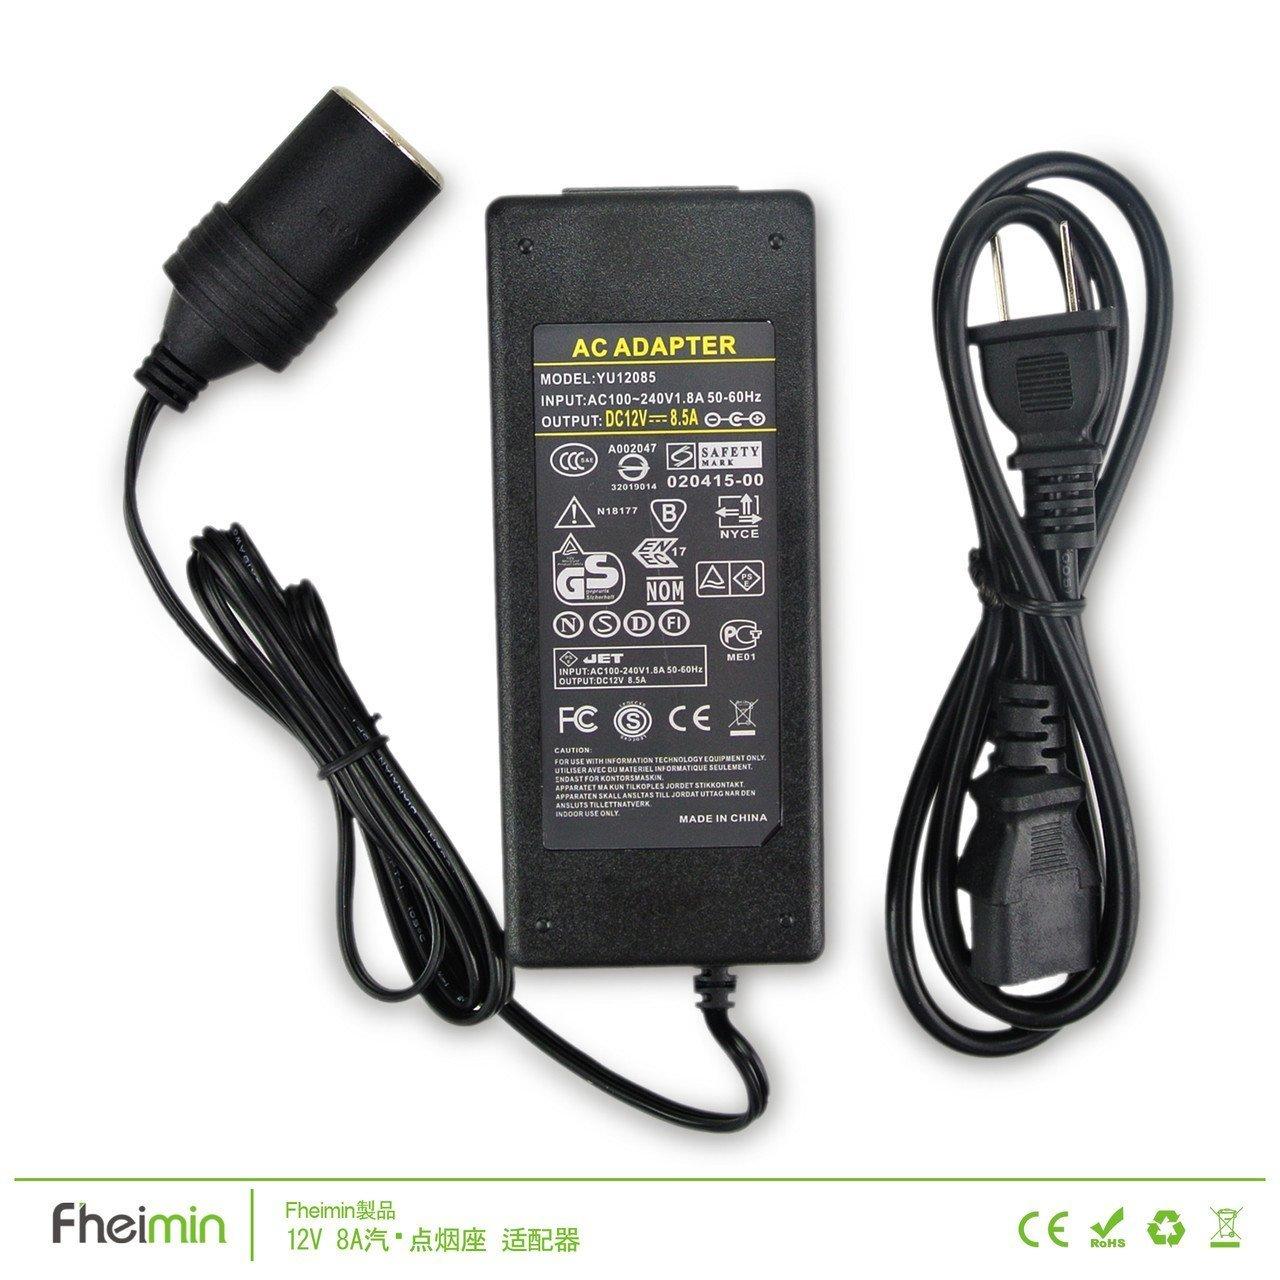 Buy Snowmobile 12v Dc Power Port Converter Rectifier Snowpower Xl Supply Simple 12vac To 12vdc Fheimin 96w 8a Ac Adapter Car Cigarette Lighter Socket